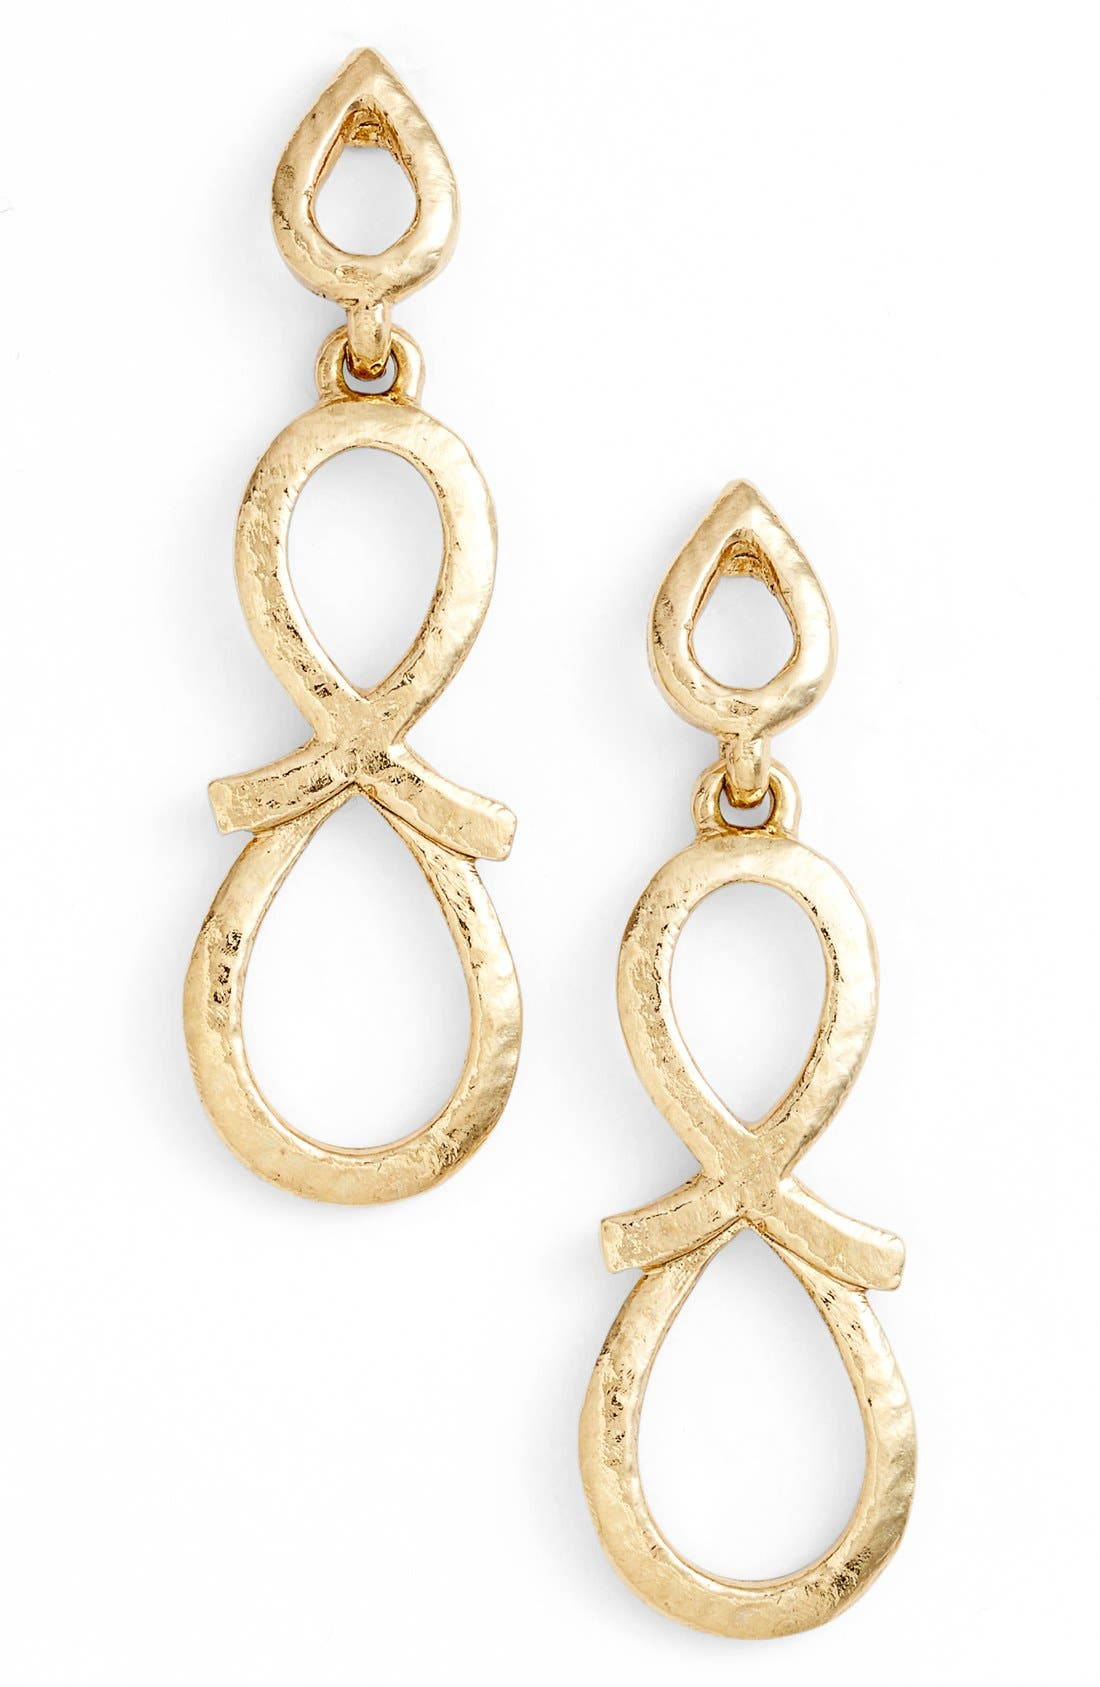 Alternate Image 1 Selected - Oscar de la Renta 'Infinity Loop' Drop Earrings